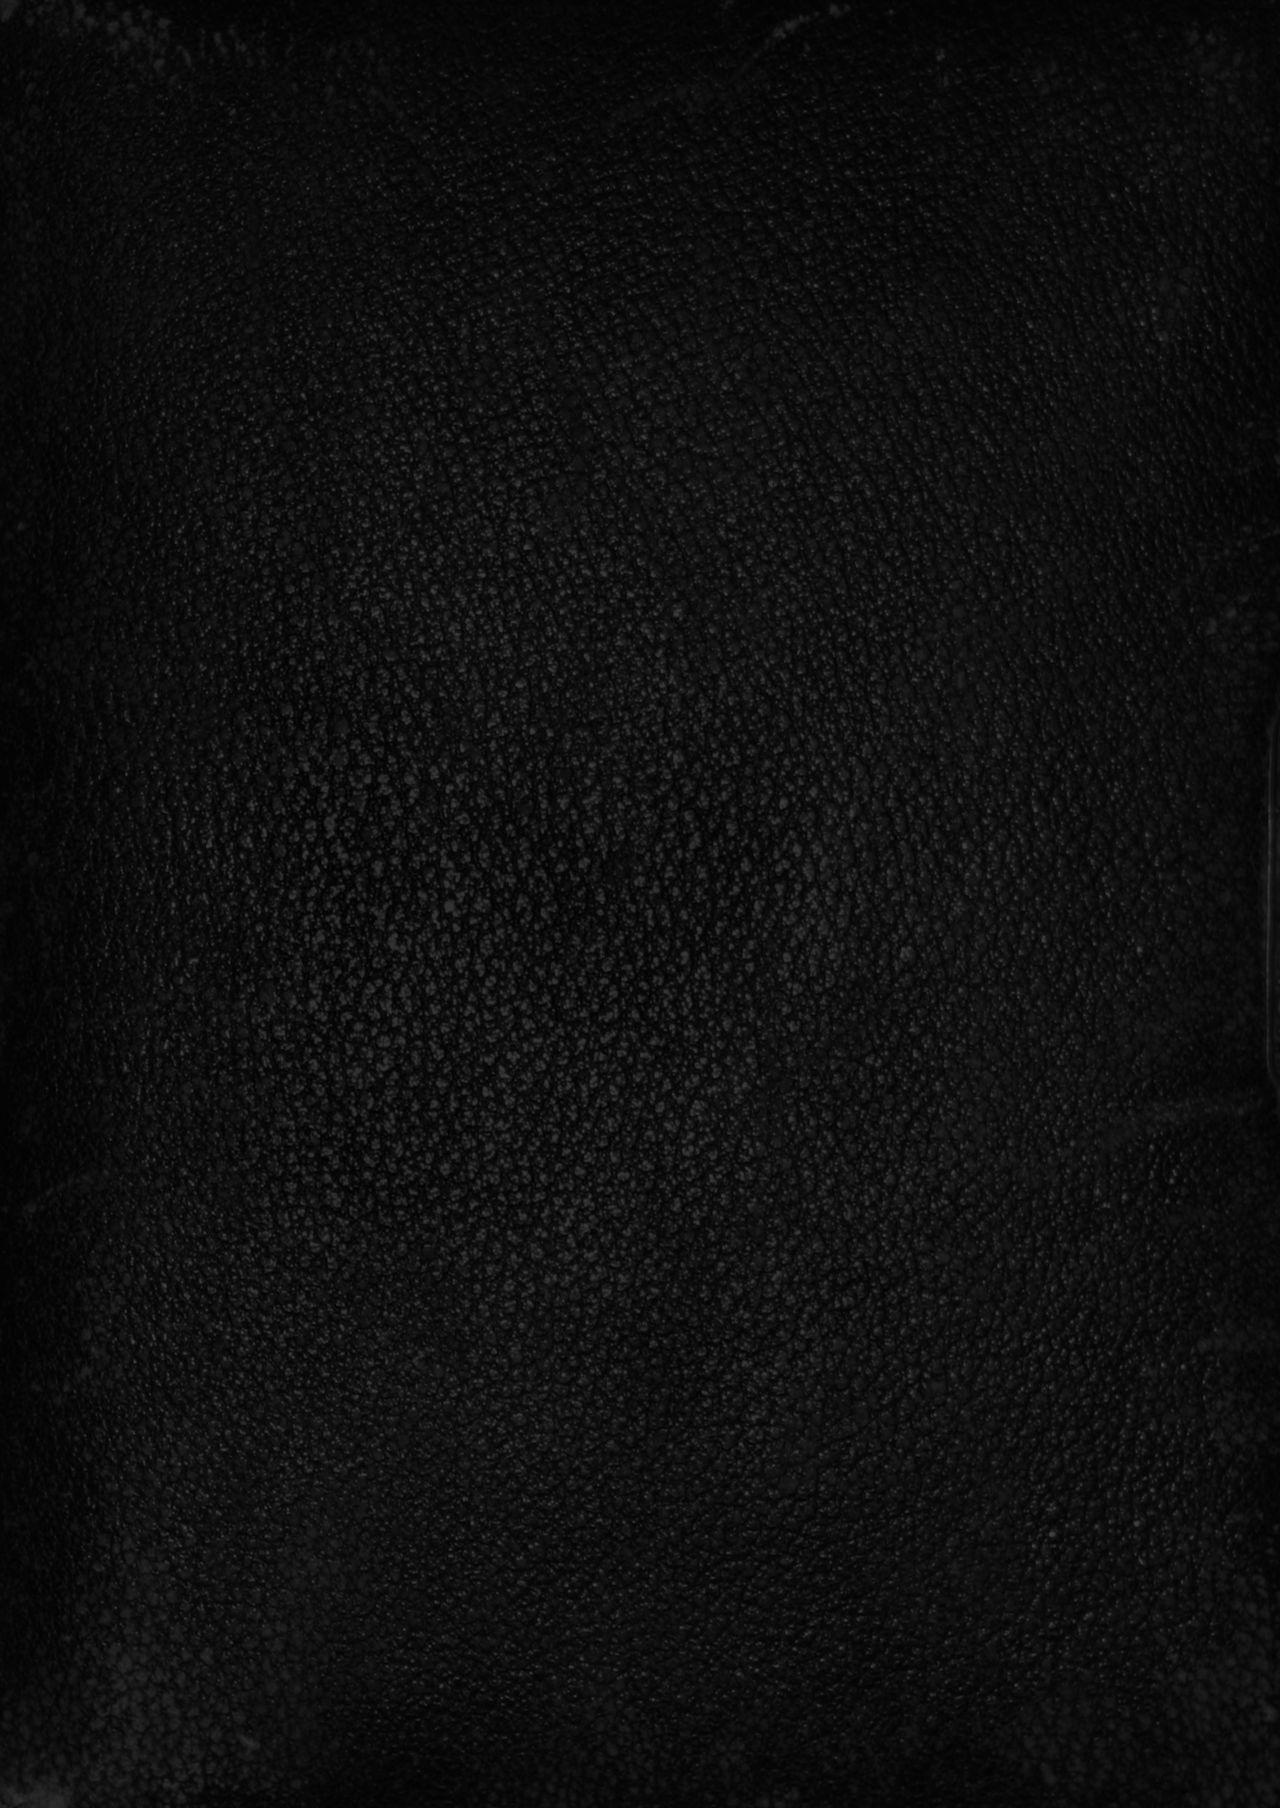 Isekai Harem Monogatari Soushuuhen 1 169